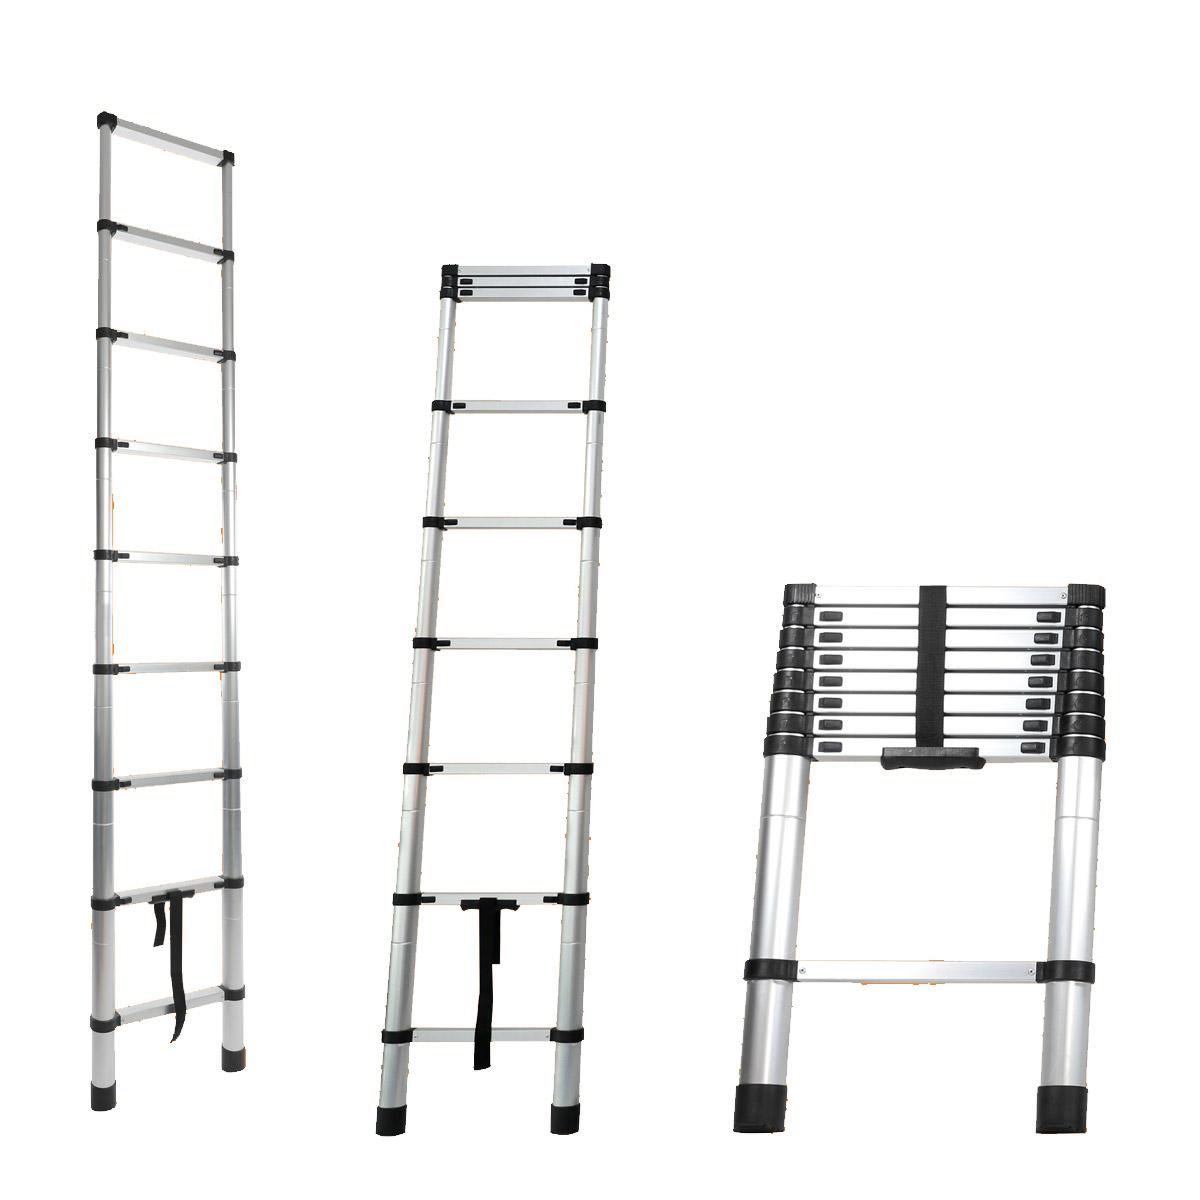 Escada alumínio telescópica 10 degraus 3,2m Starfer